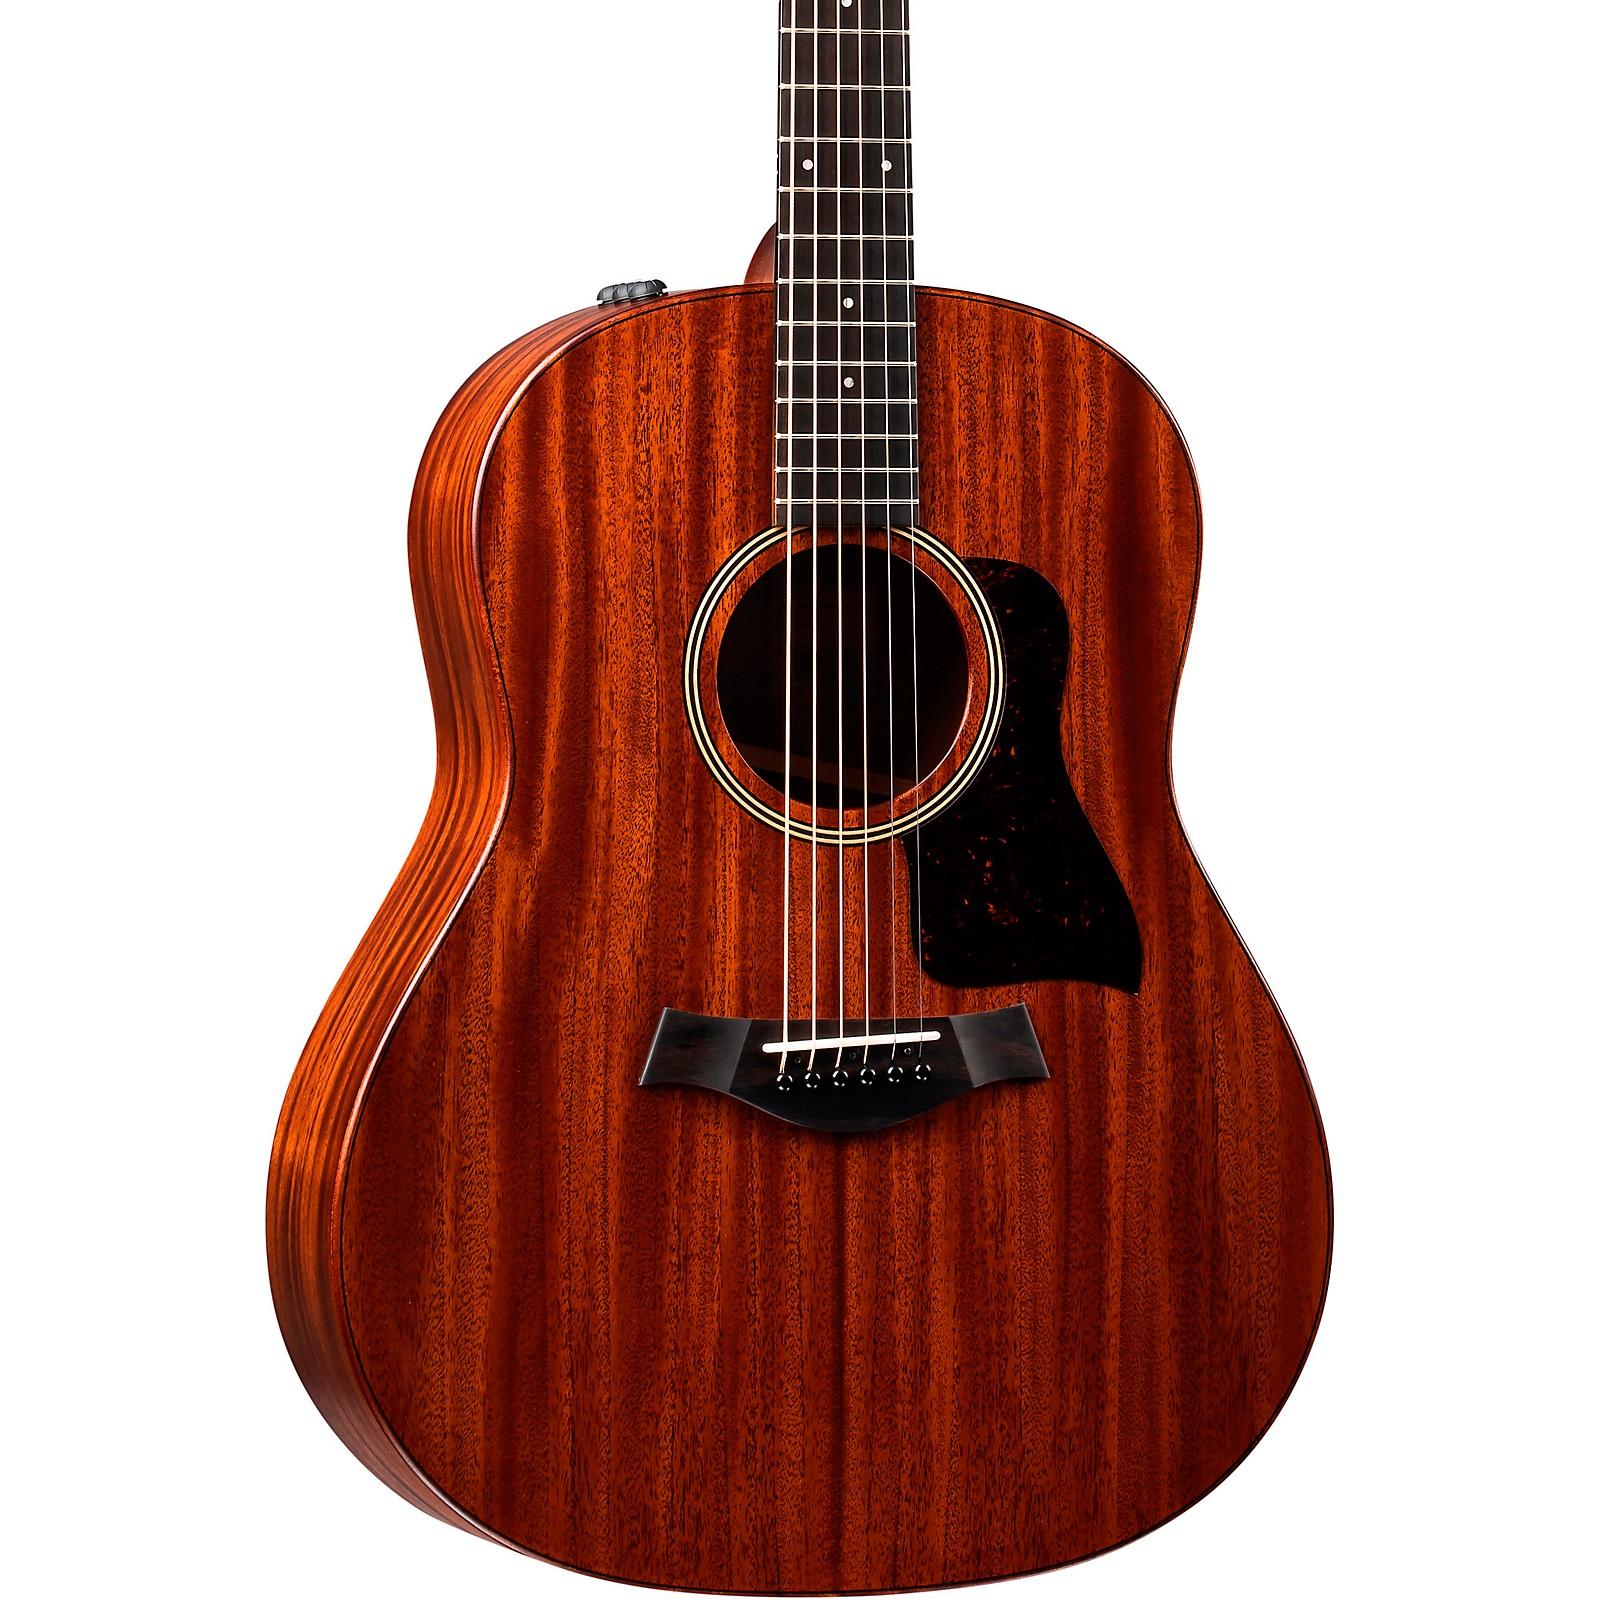 Taylor AD27e American Dream Grand Pacific Acoustic-Electric Guitar